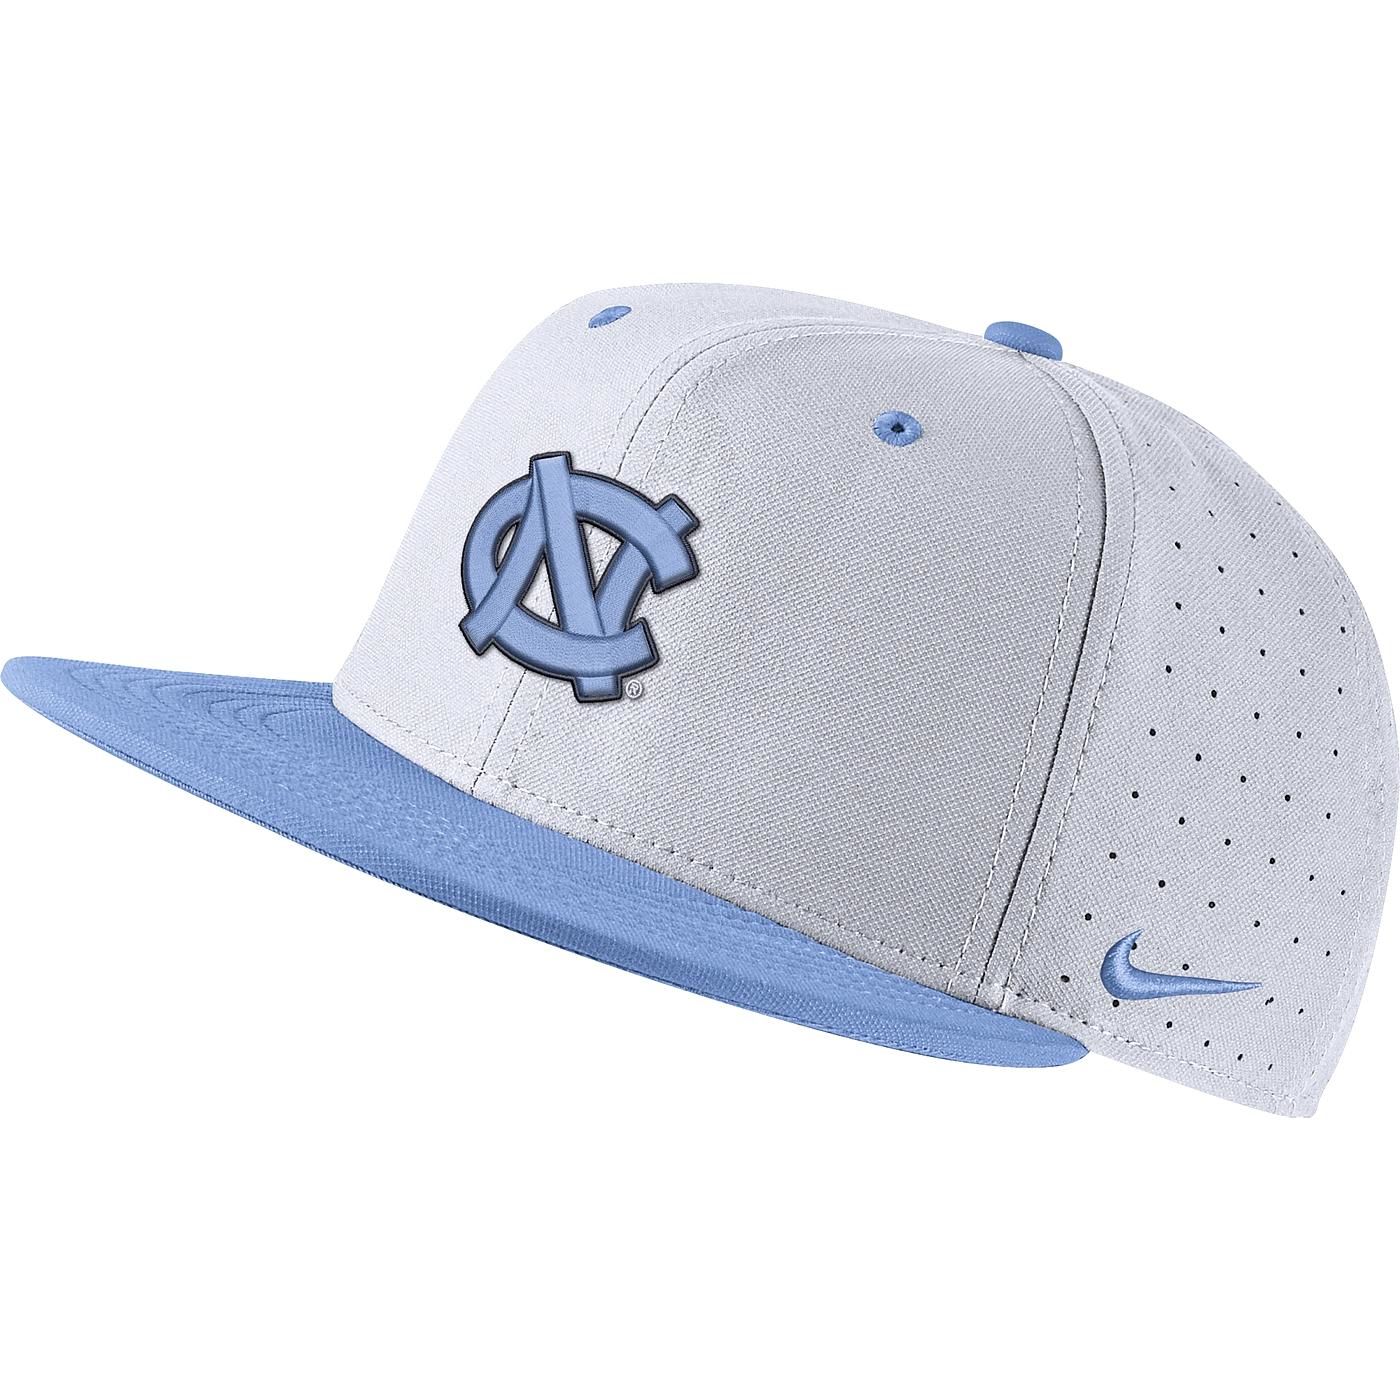 best service 61e7b 420ac Johnny T-shirt - North Carolina Tar Heels - Nike Aerobill True Baseball  Fitted Hat (White CB) by Nike